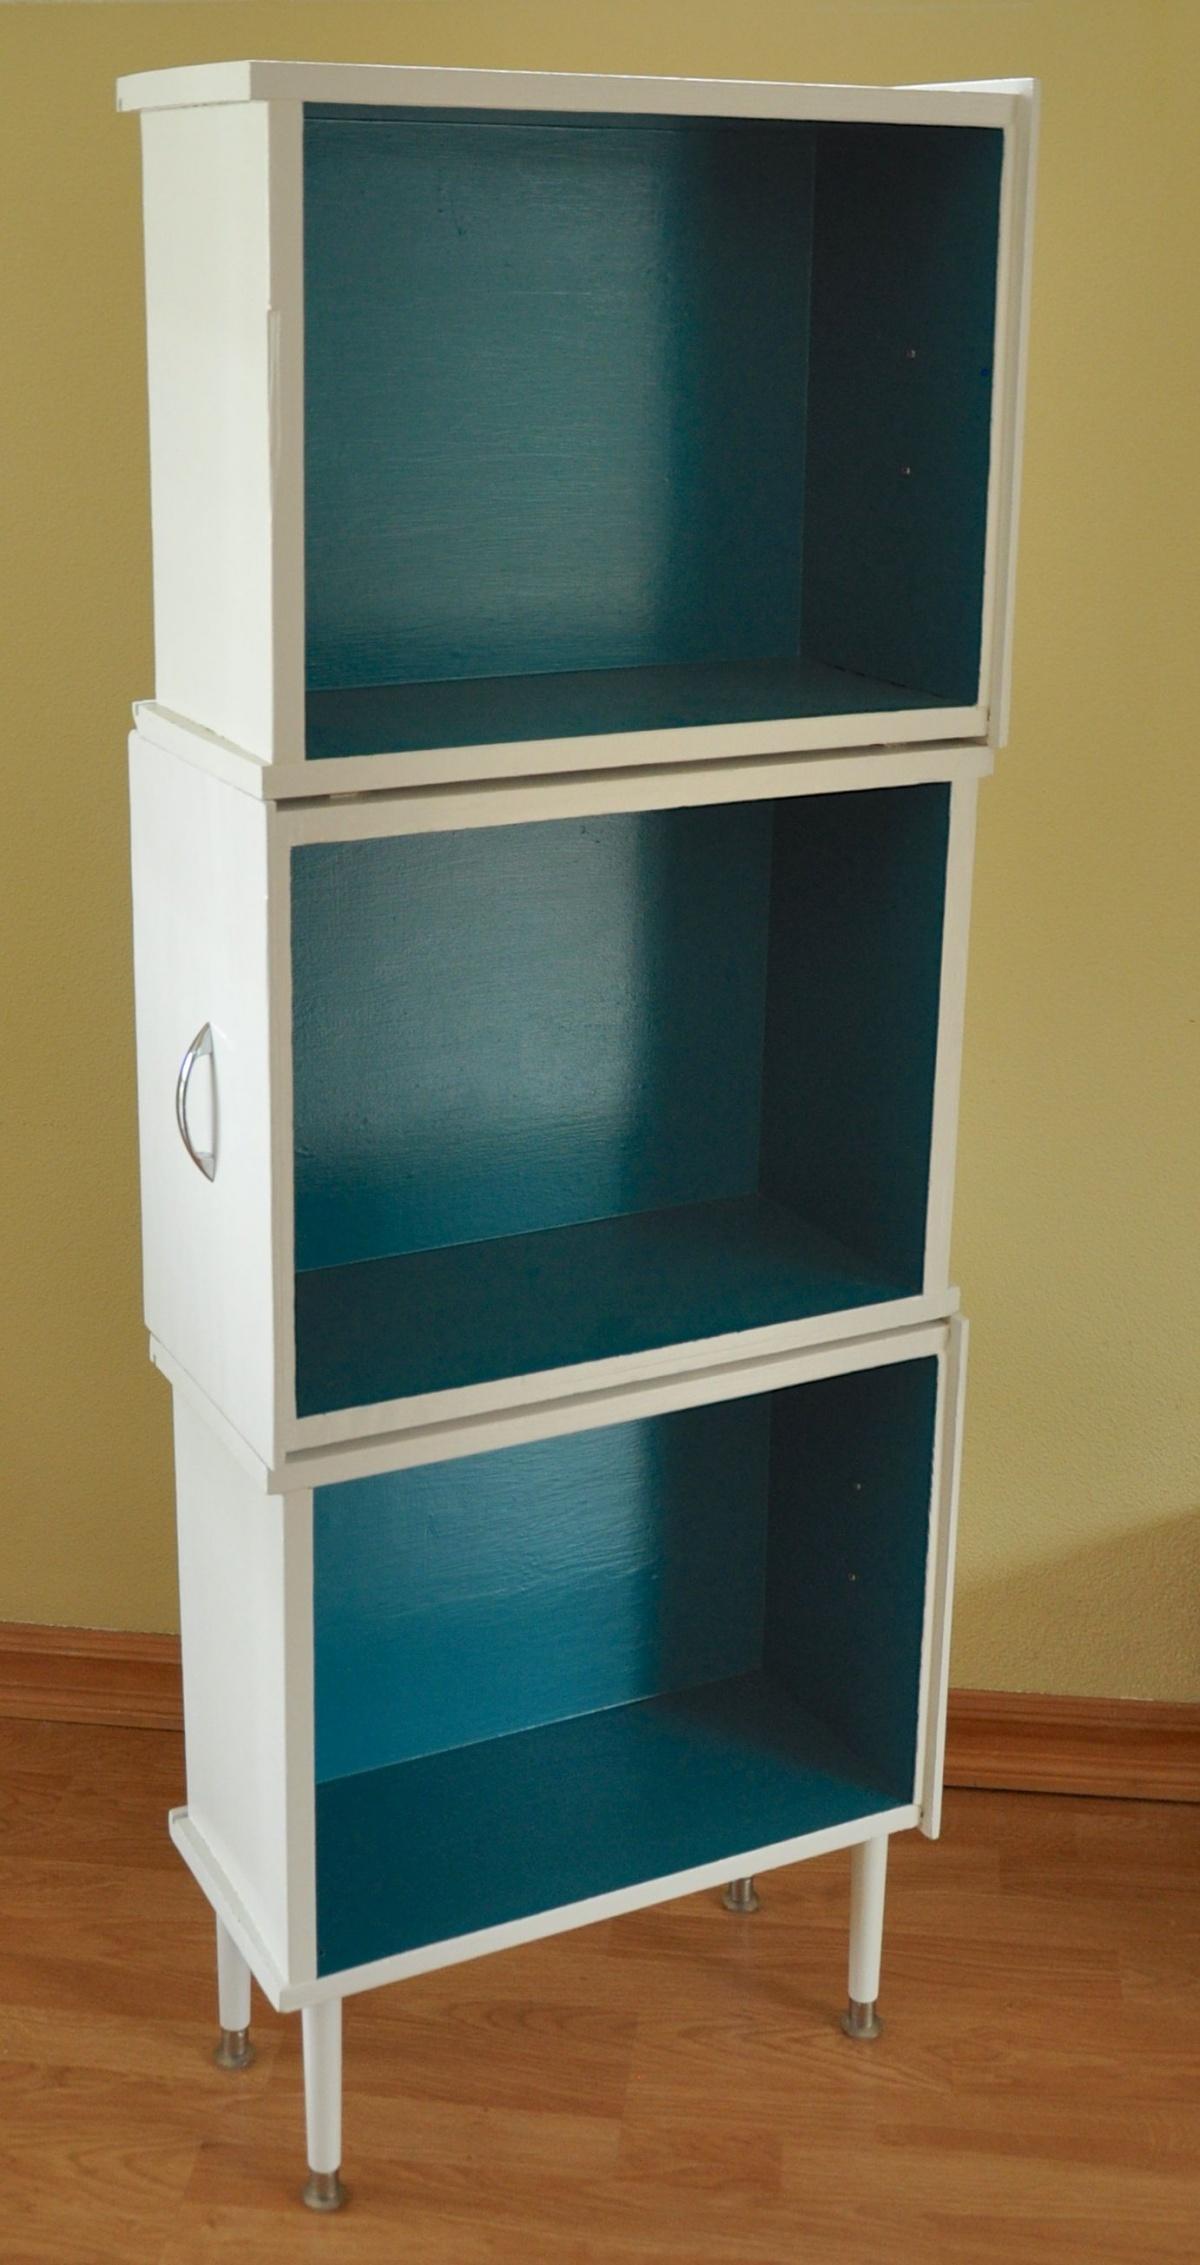 Repurpose old drawers